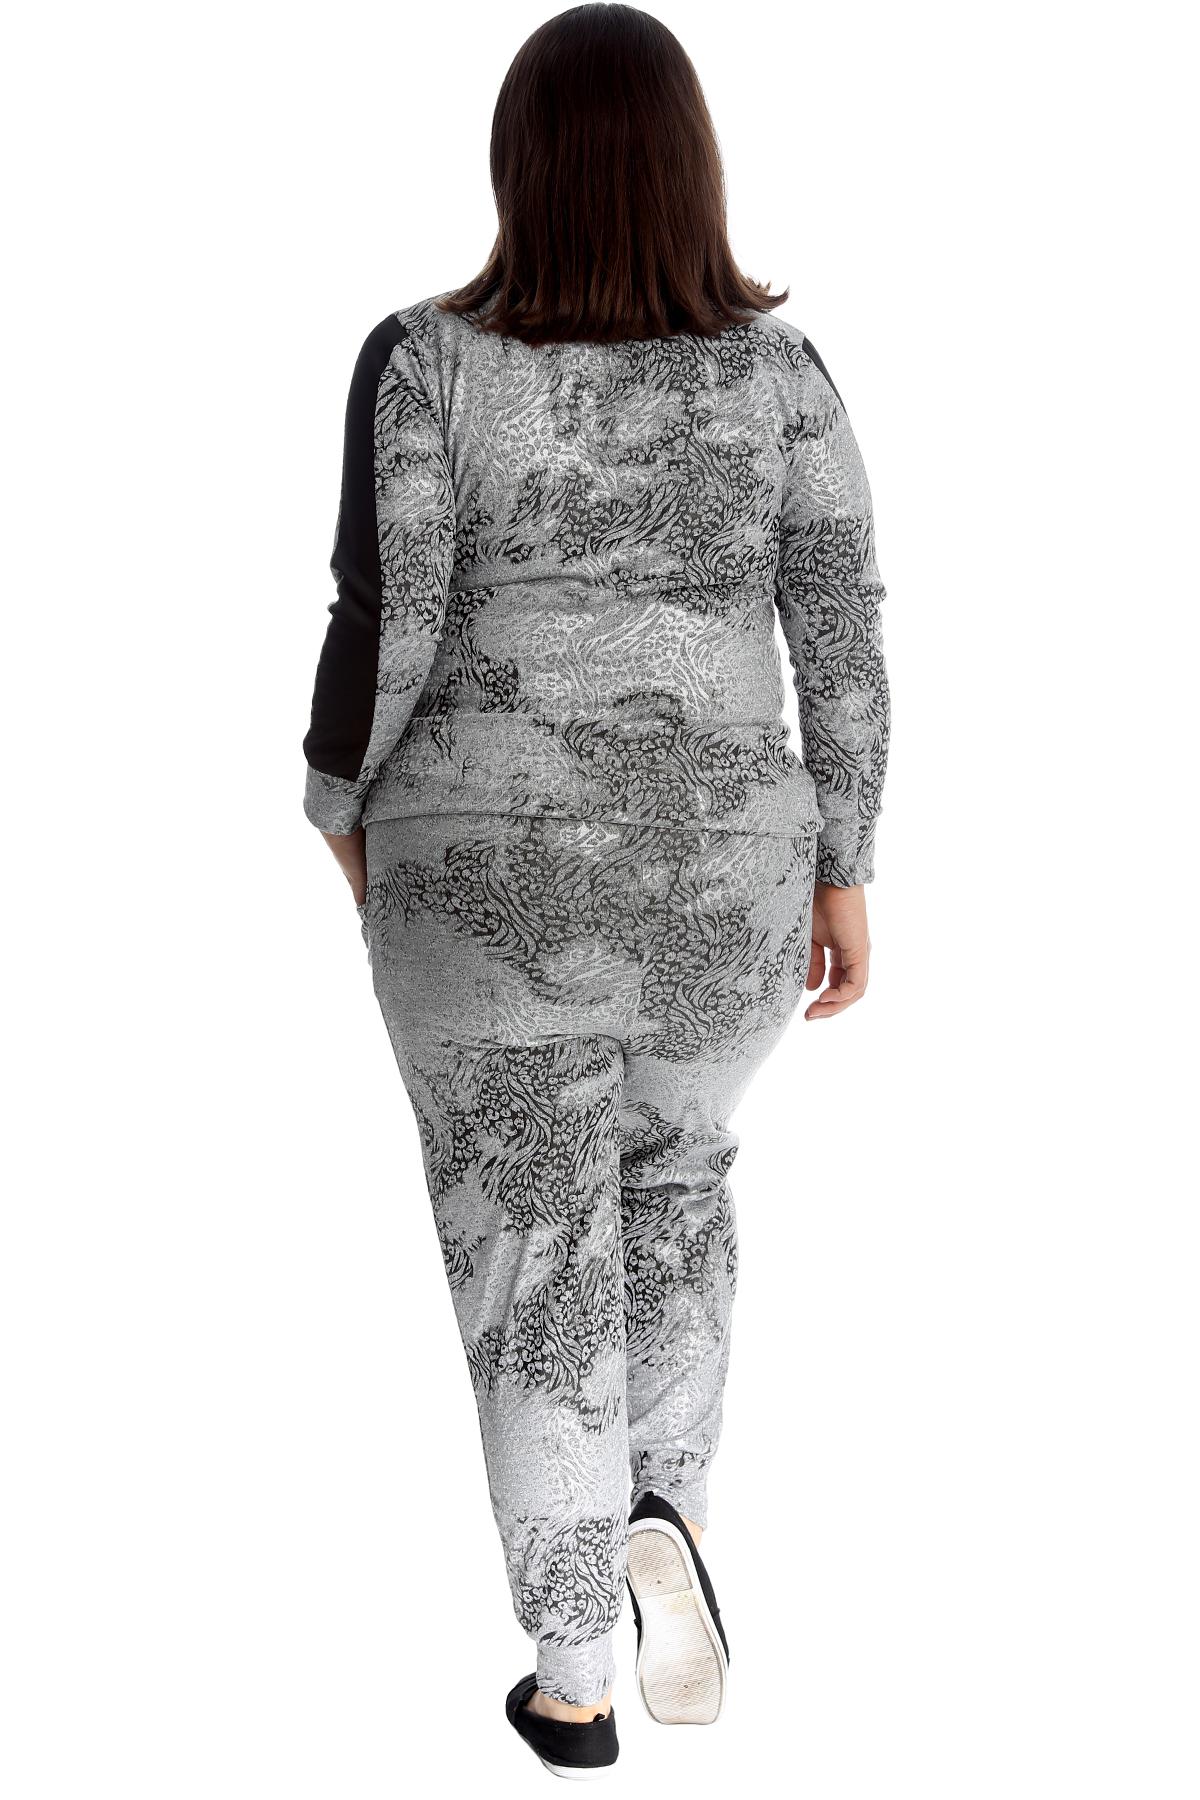 Ladies Women Snake Print Loungewear Tracksuit Full Outwear Jogging Suit